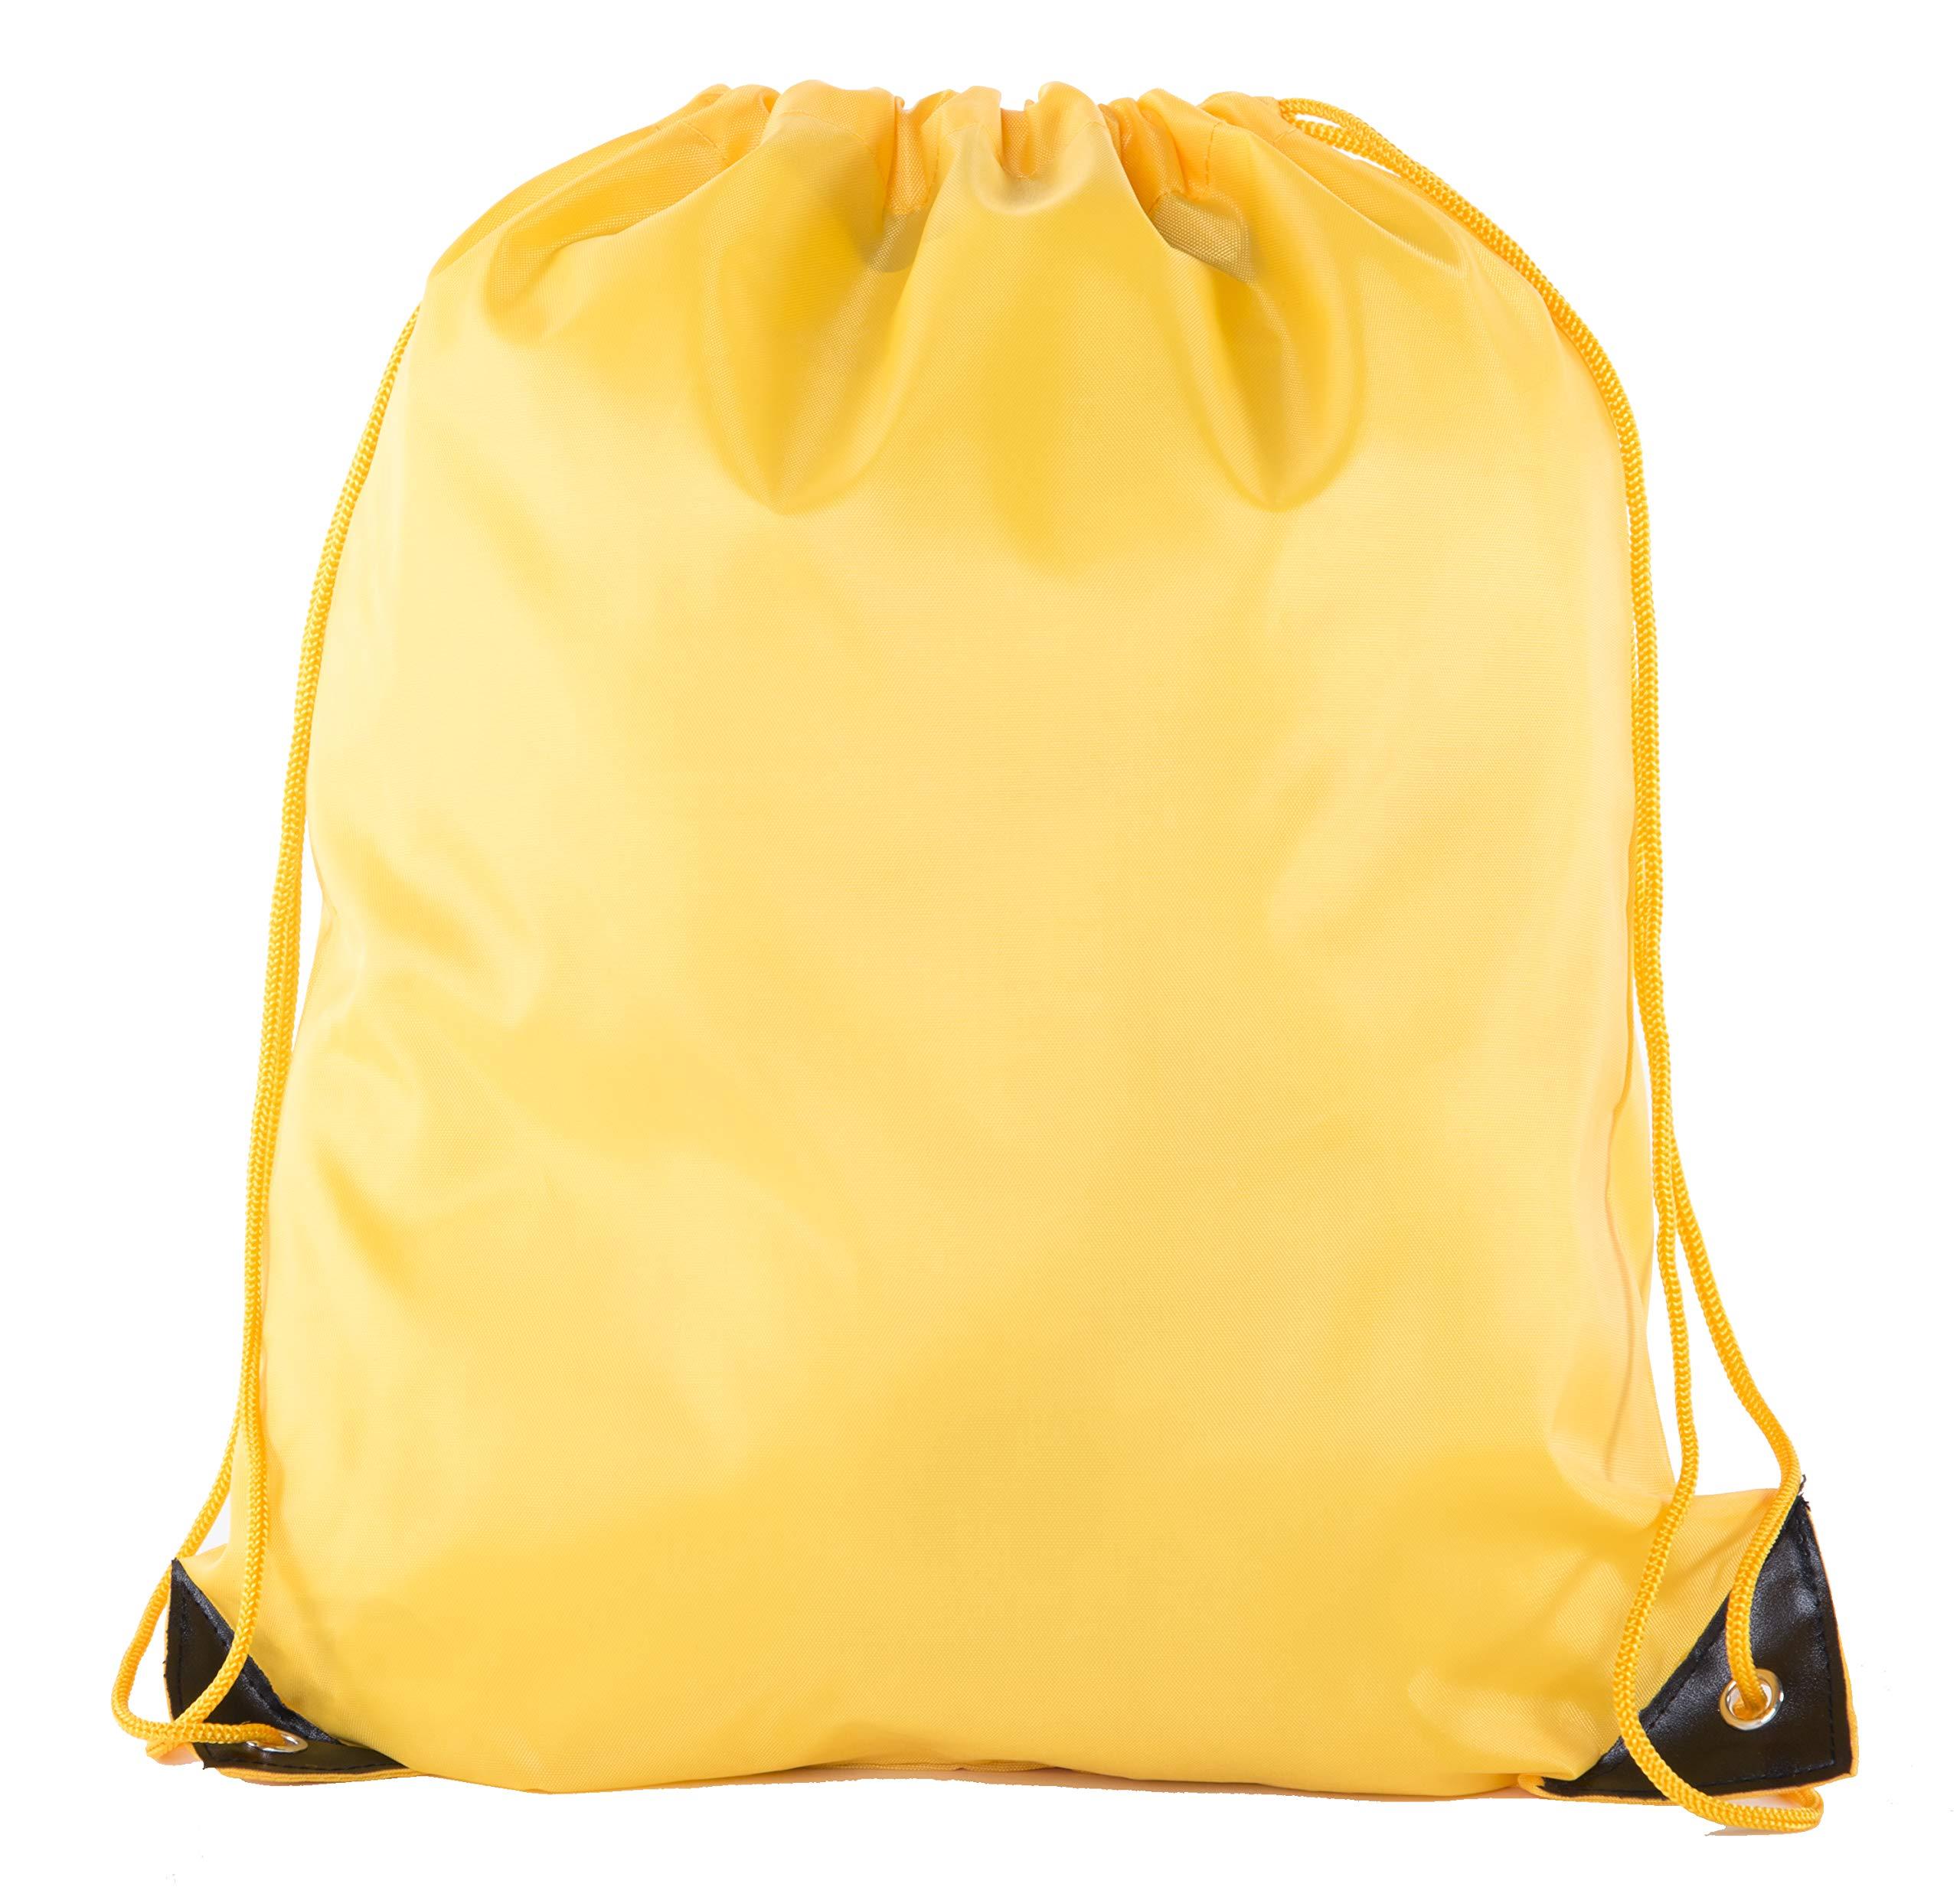 Mato & Hash Drawstring Bulk Bags Cinch Sacks Backpack Pull String Bags | 15 Colors | 1PK-100PK Available